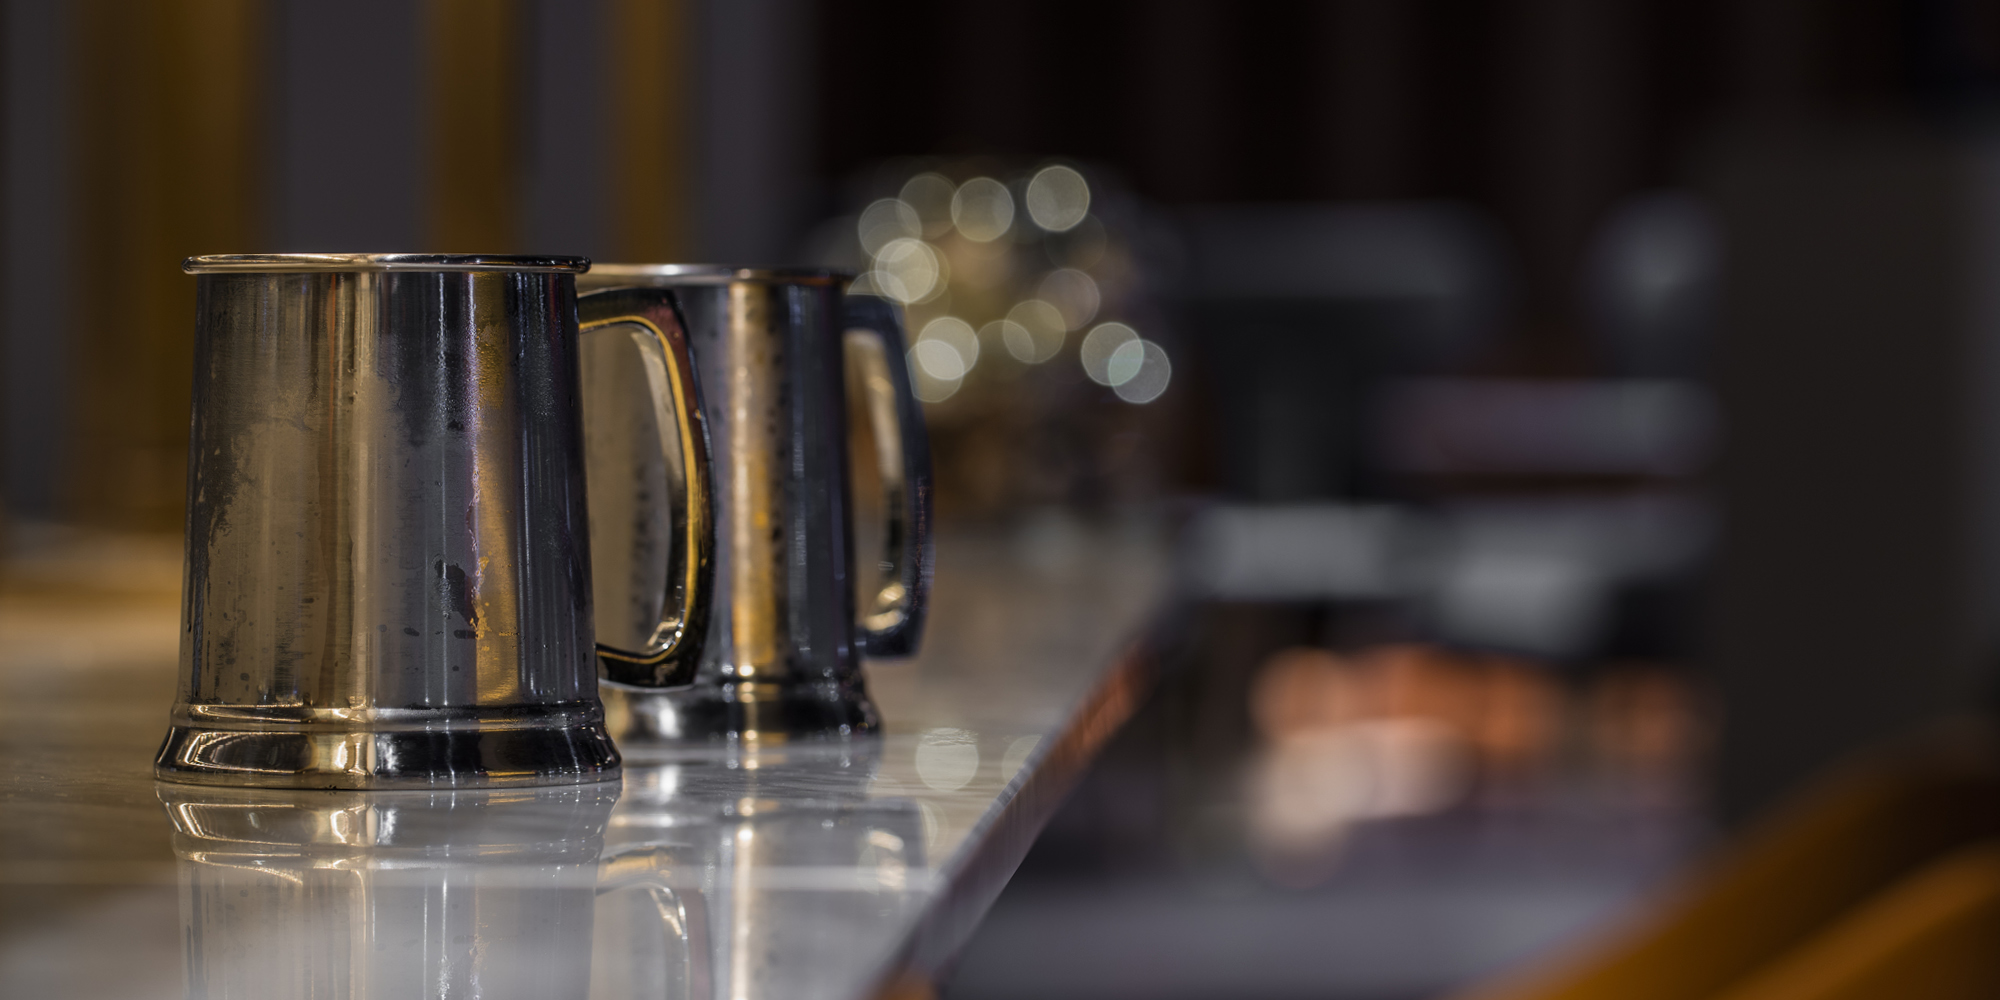 The Grahamston Bar I Grahamston Ale served inside a silver tankard